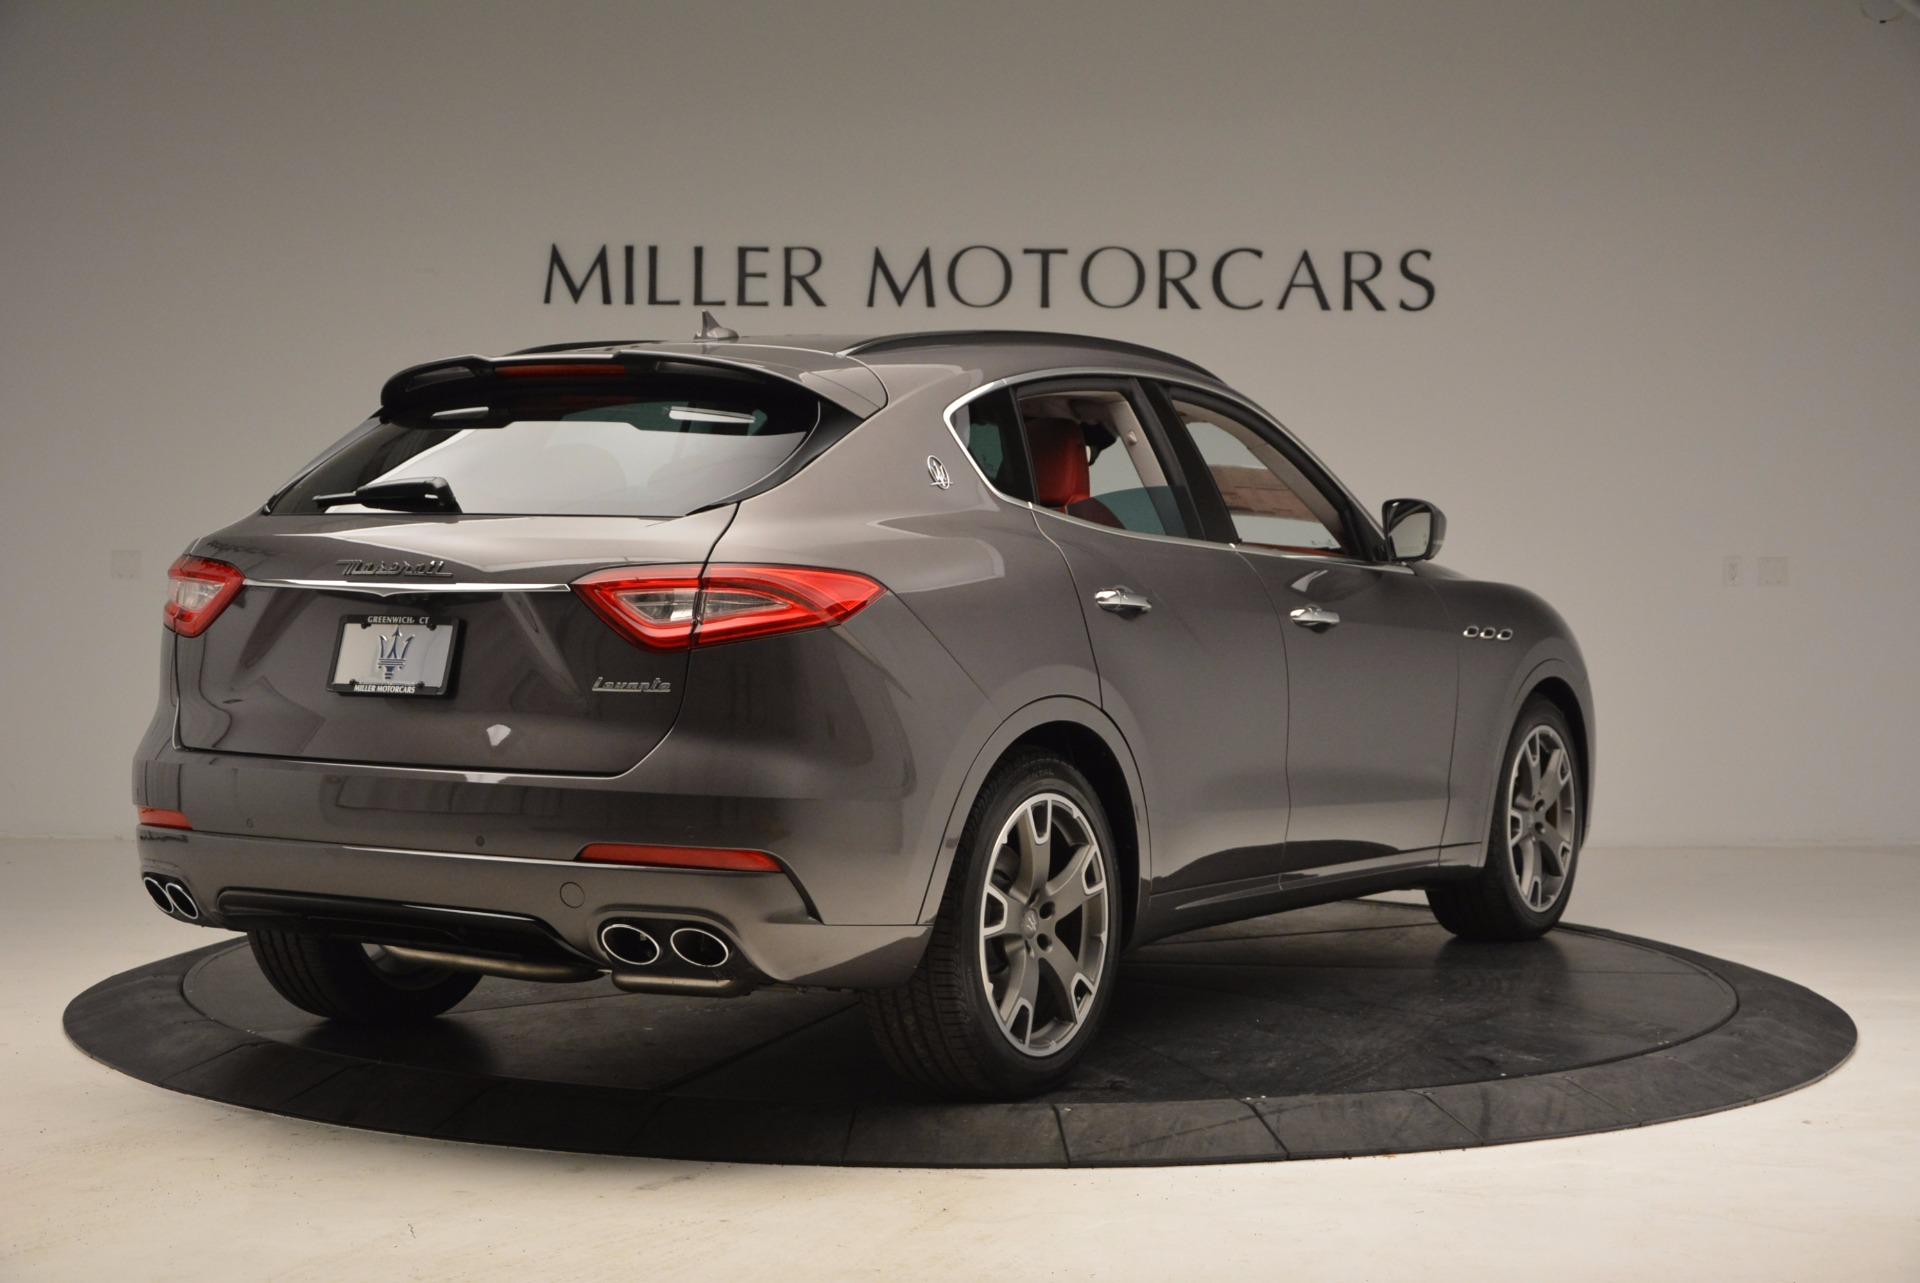 New 2017 Maserati Levante  For Sale In Westport, CT 1017_p7